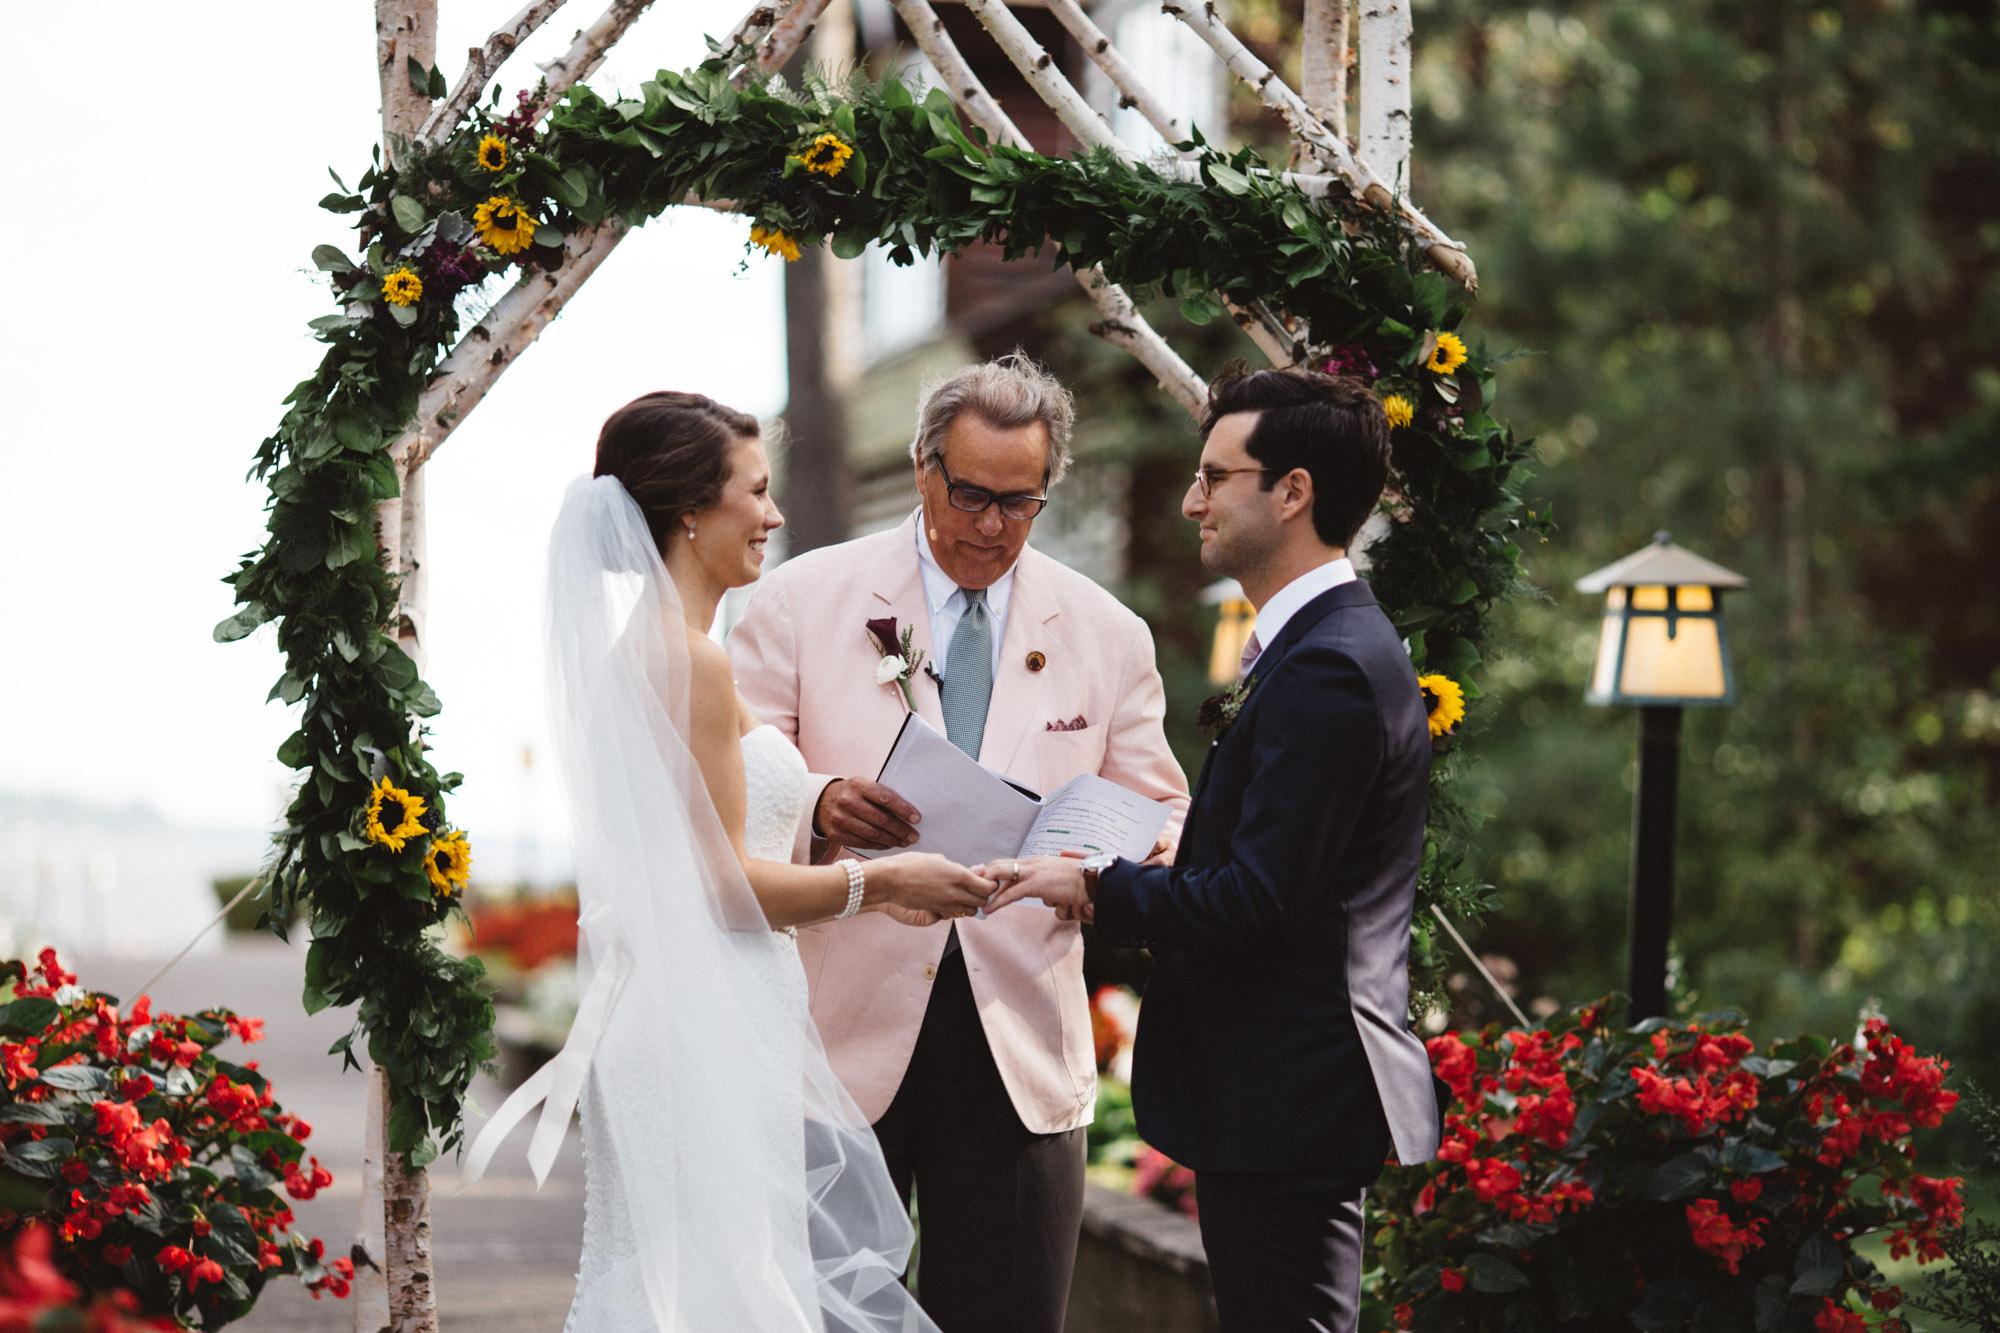 Photojournalistic wedding photography at Grand View by Britt DeZeeuw, Brainerd Minnesota photographer.